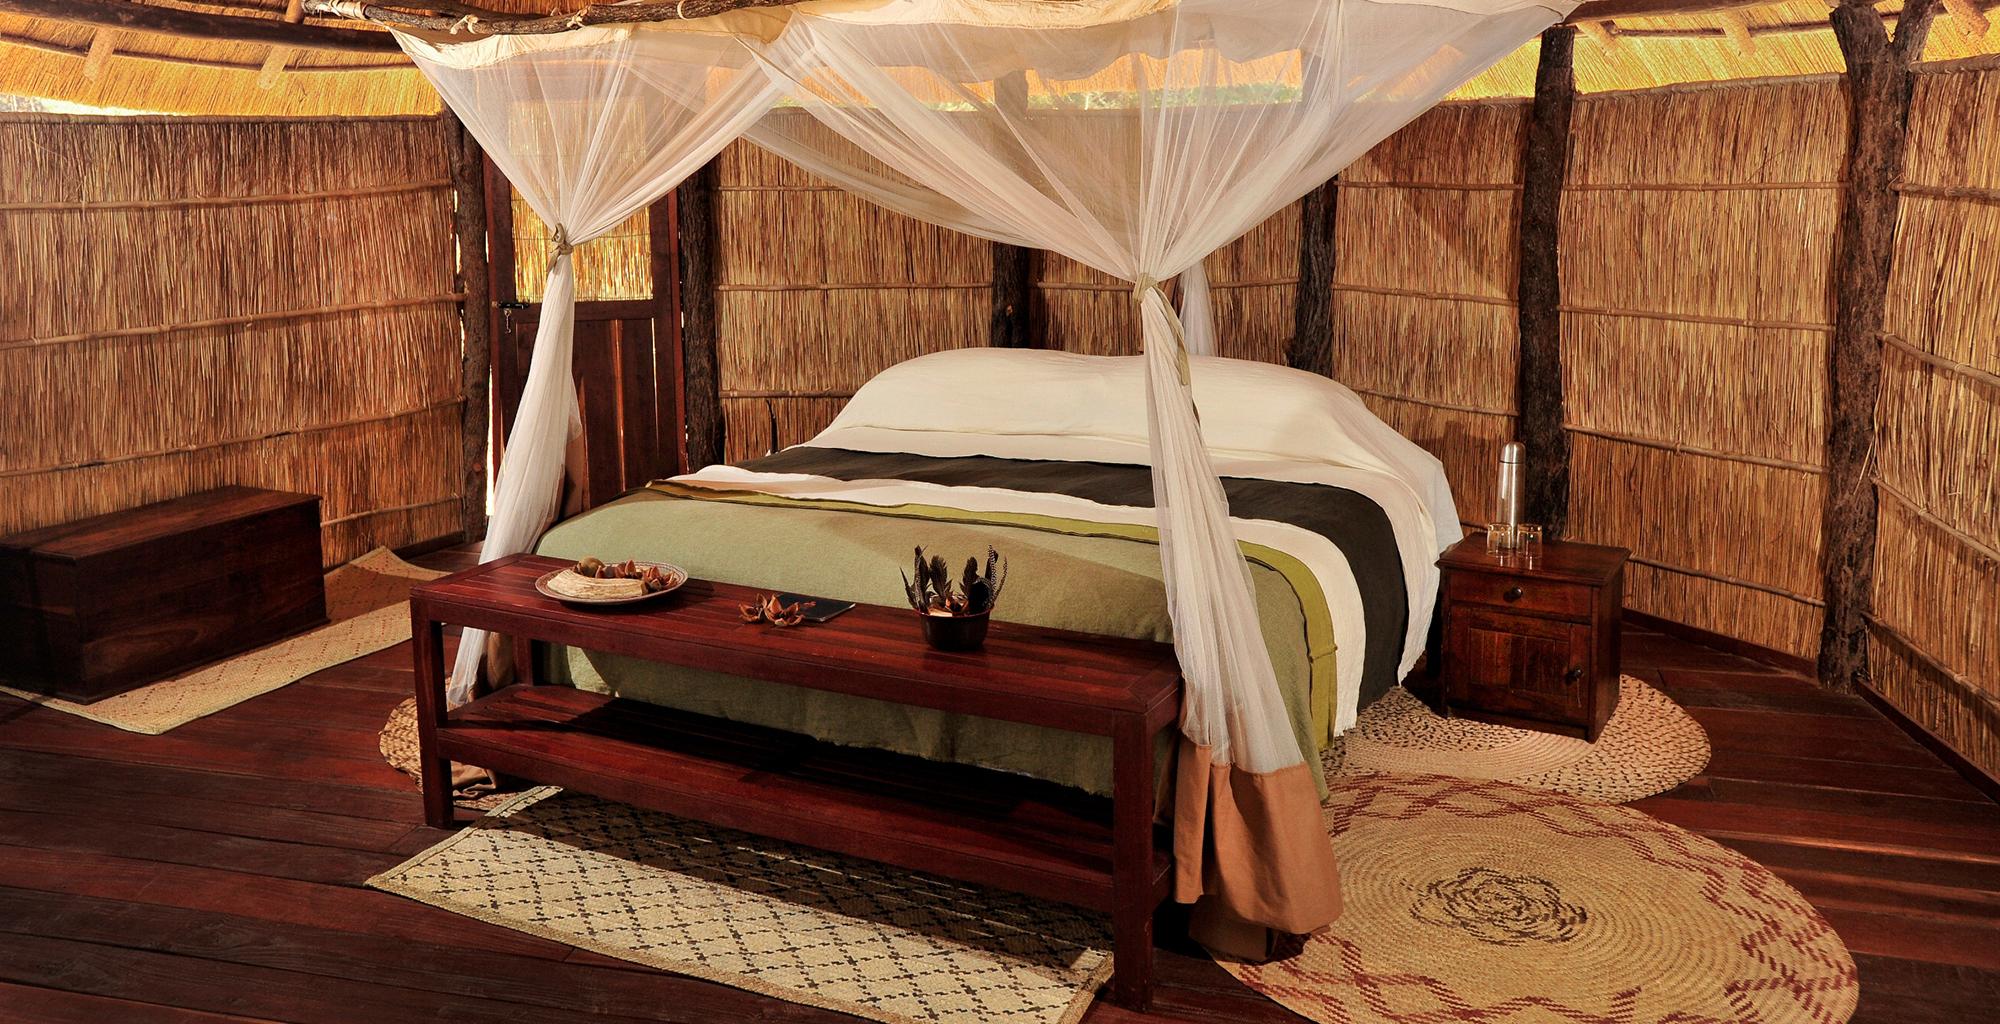 Zambia-Nsolo-Camp-Bedroom